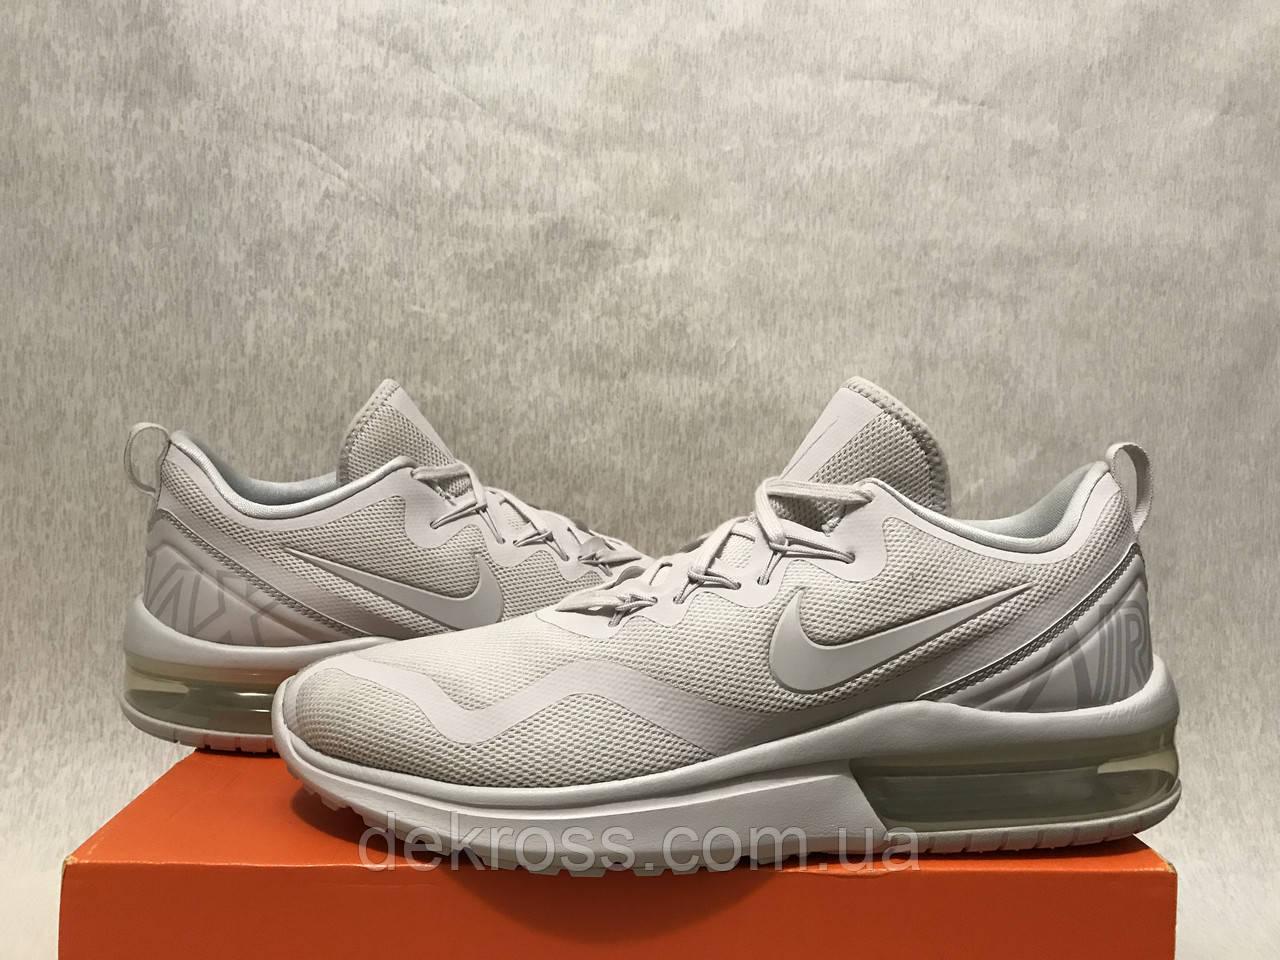 Кроссовки беговые Nike Air Max Fury Оригинал AA5739-100